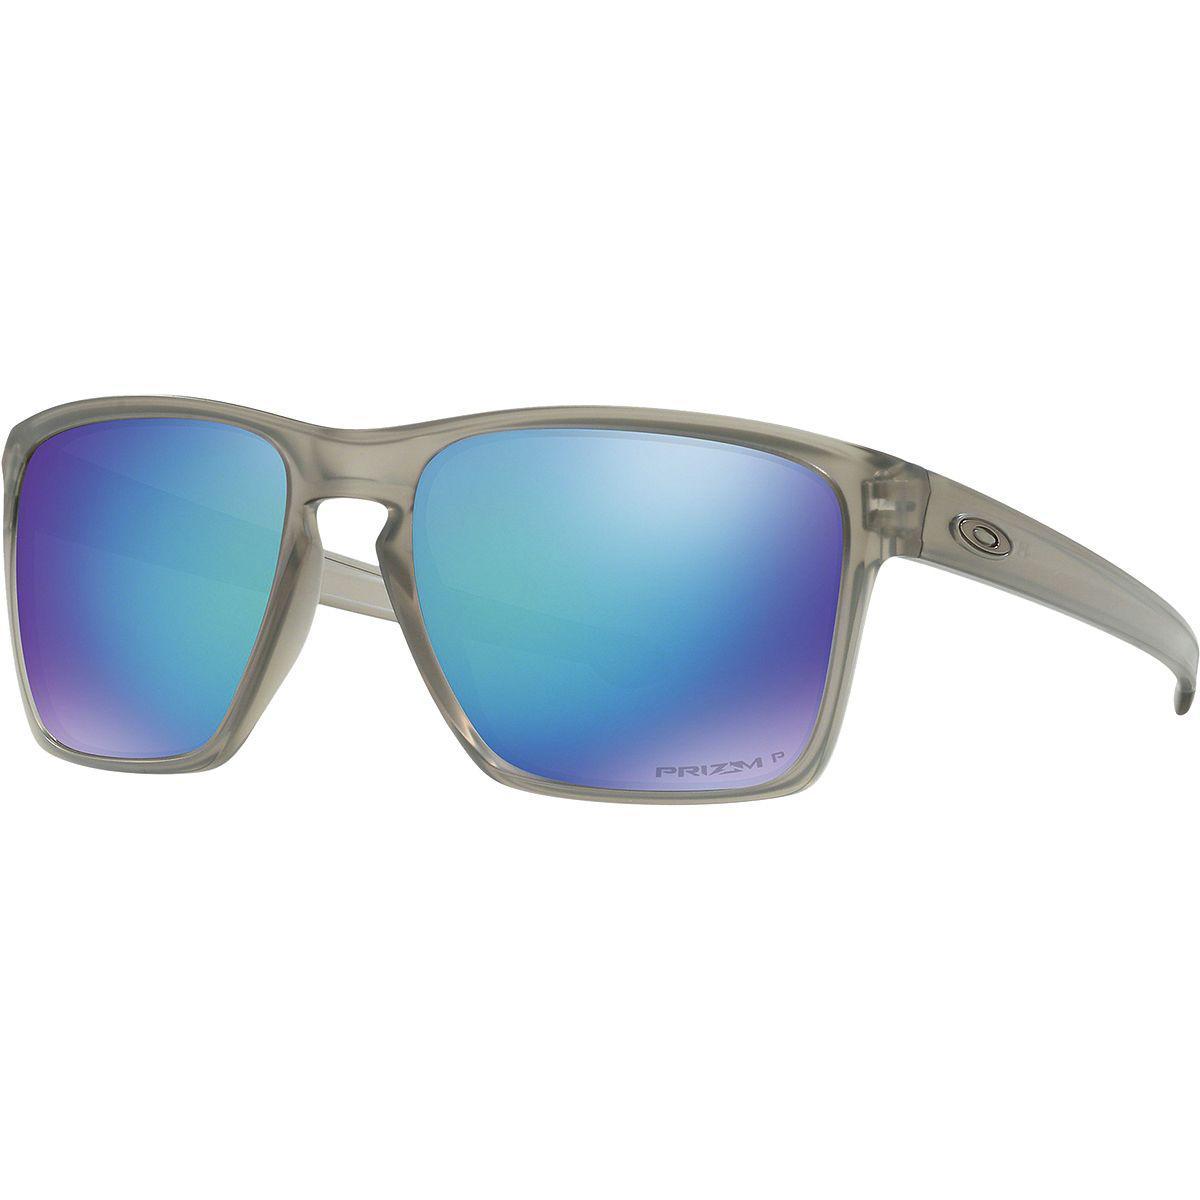 7f99d14bb0 Lyst - Oakley Sliver Prizm Polarized Sunglasses in Blue for Men